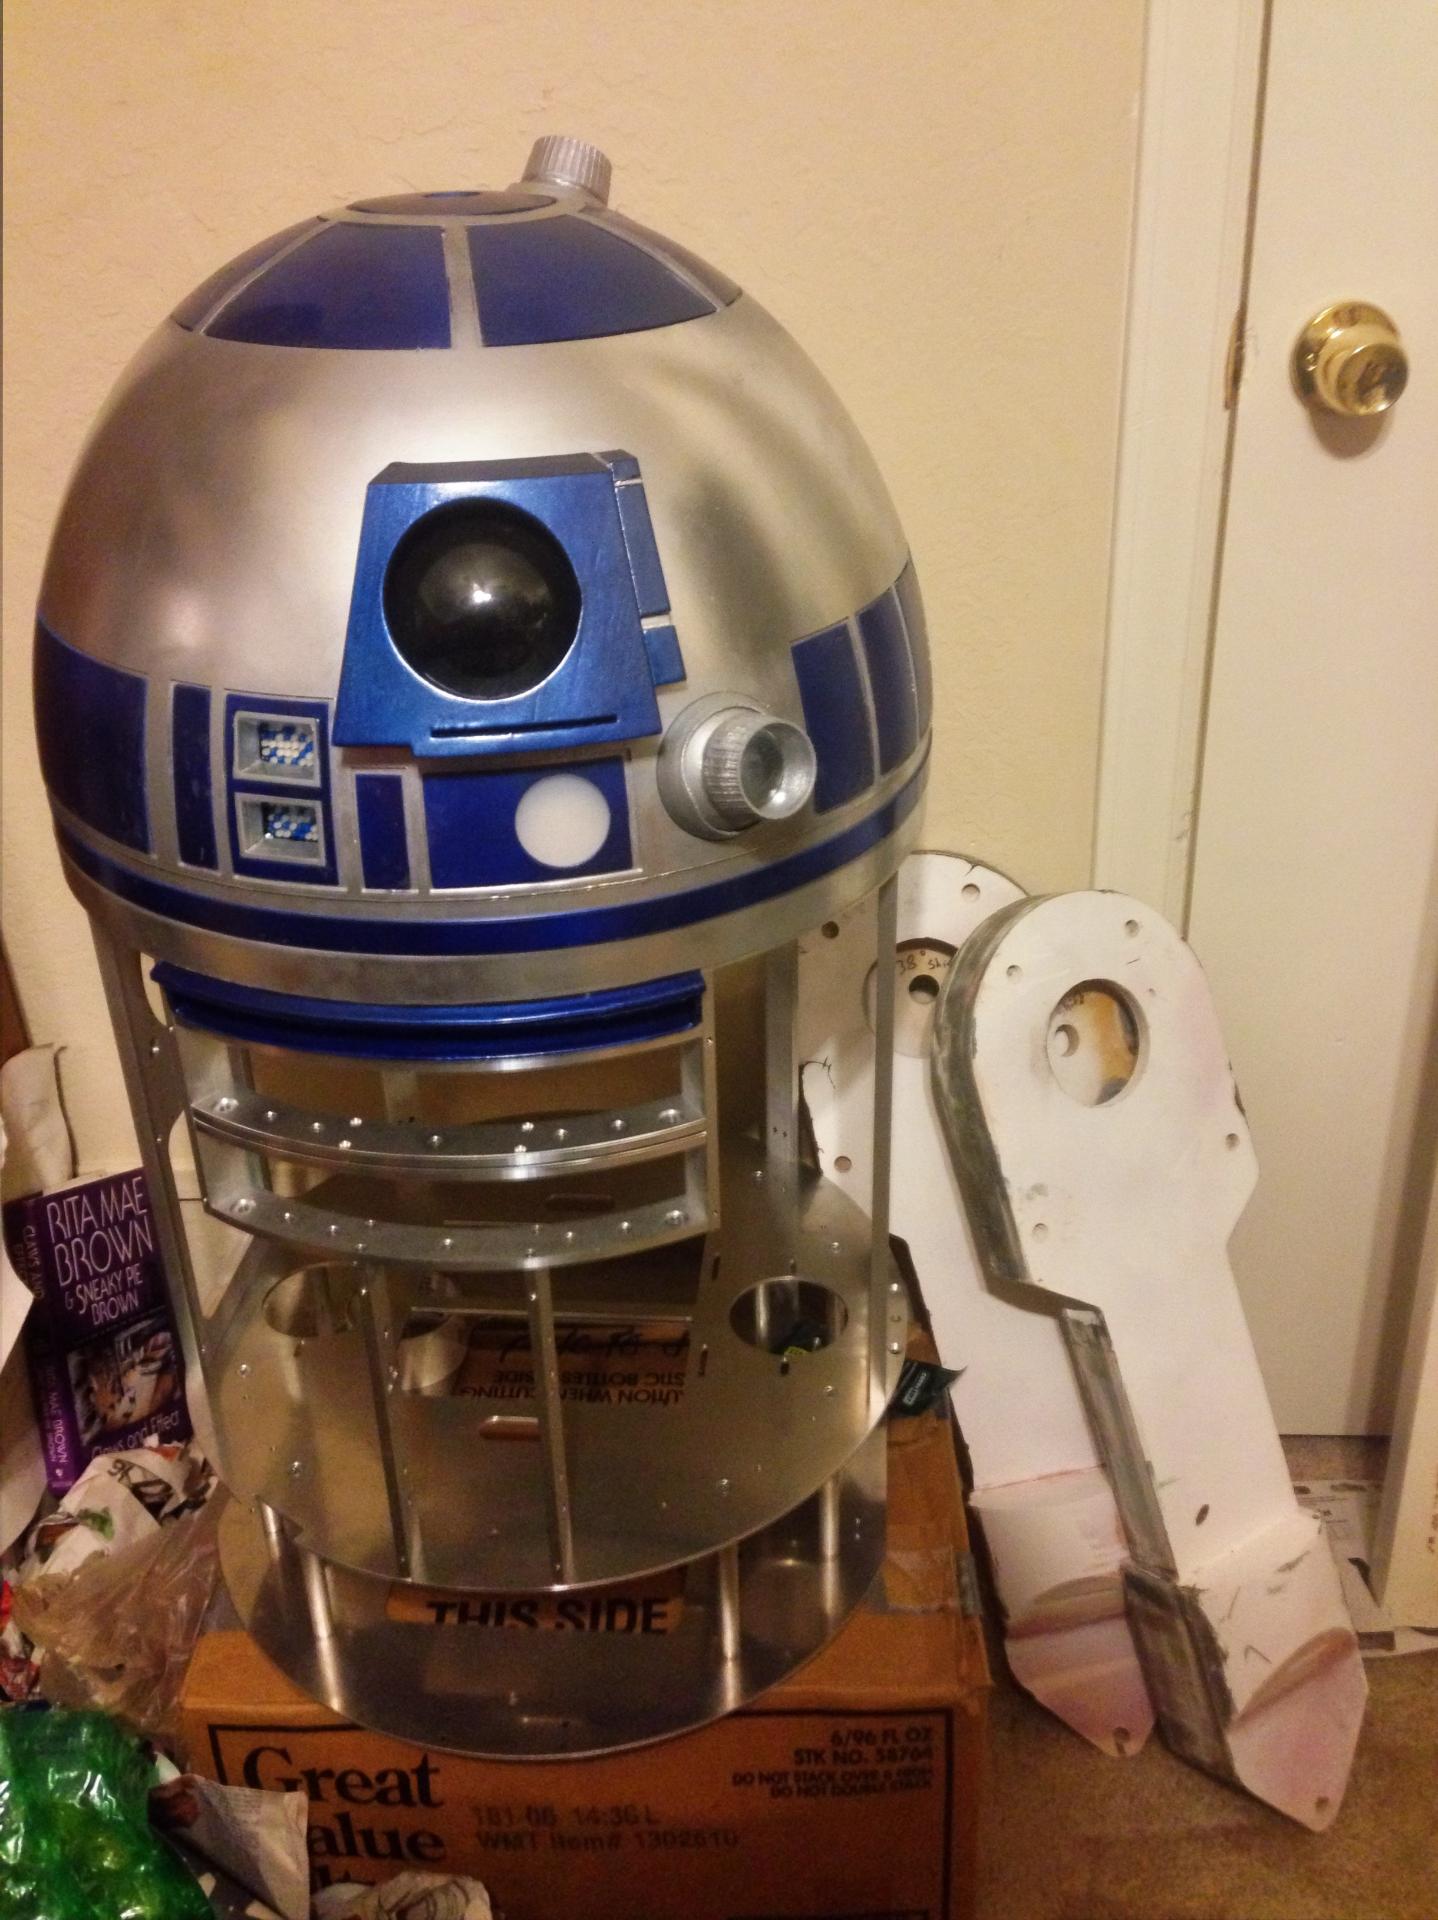 Kelly's R2-D2